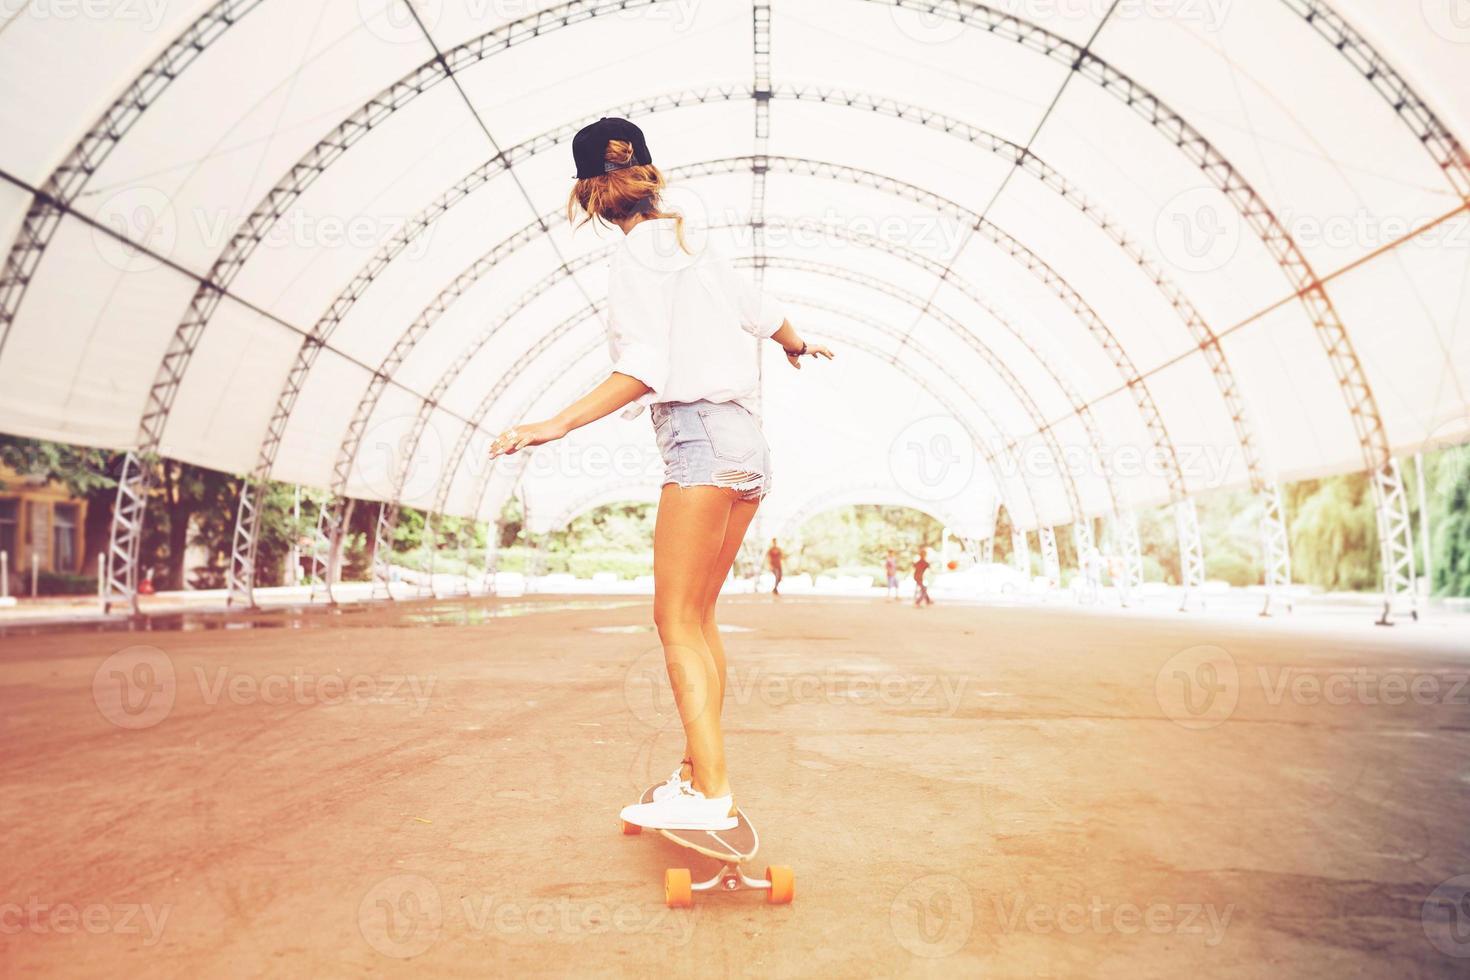 estilo de vida da moda, mulher jovem e bonita com longboard foto